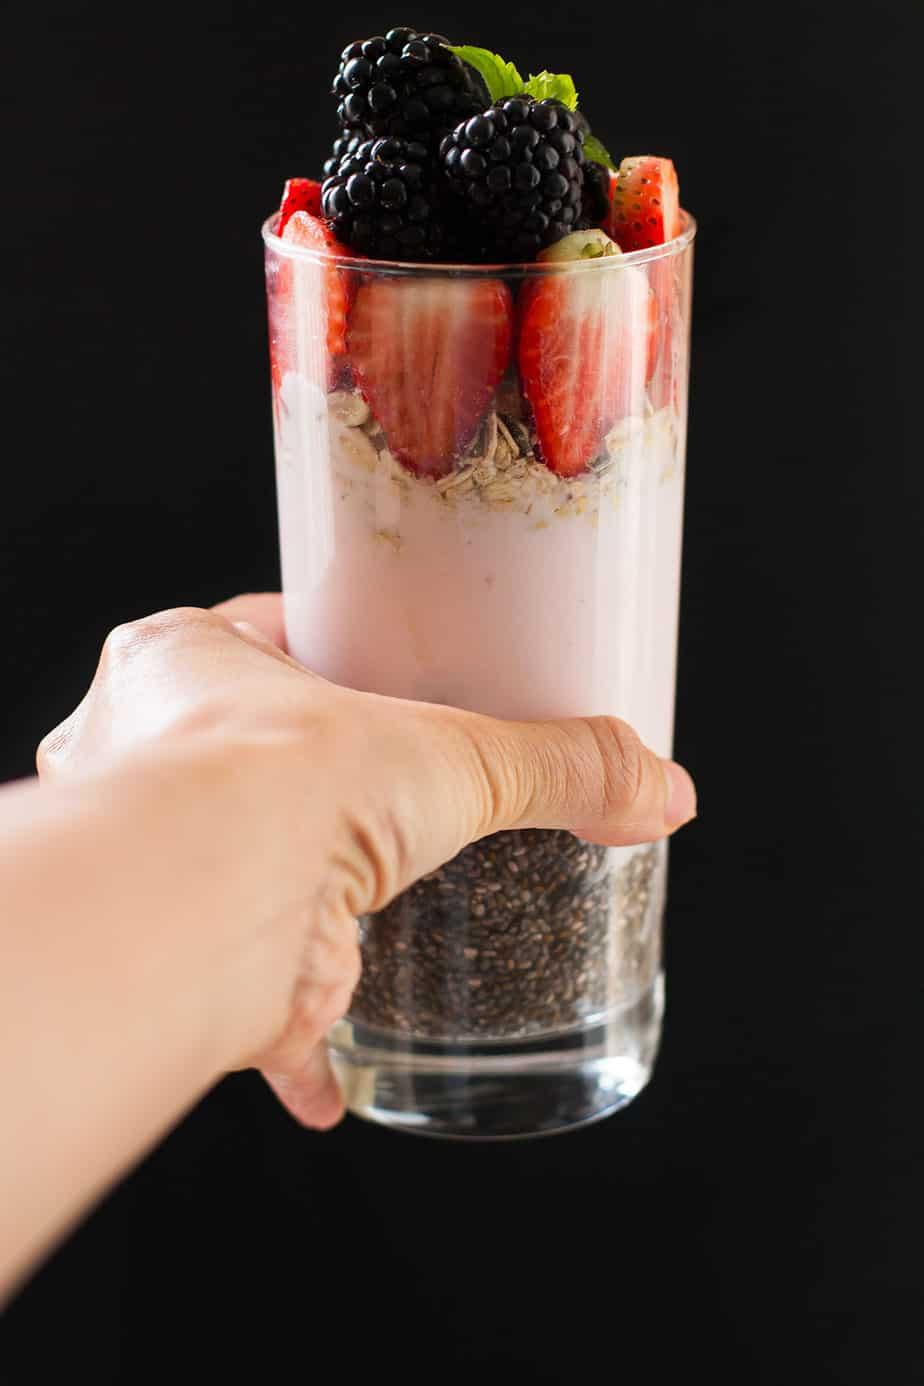 yogurt-diet-plan-recipe-idea